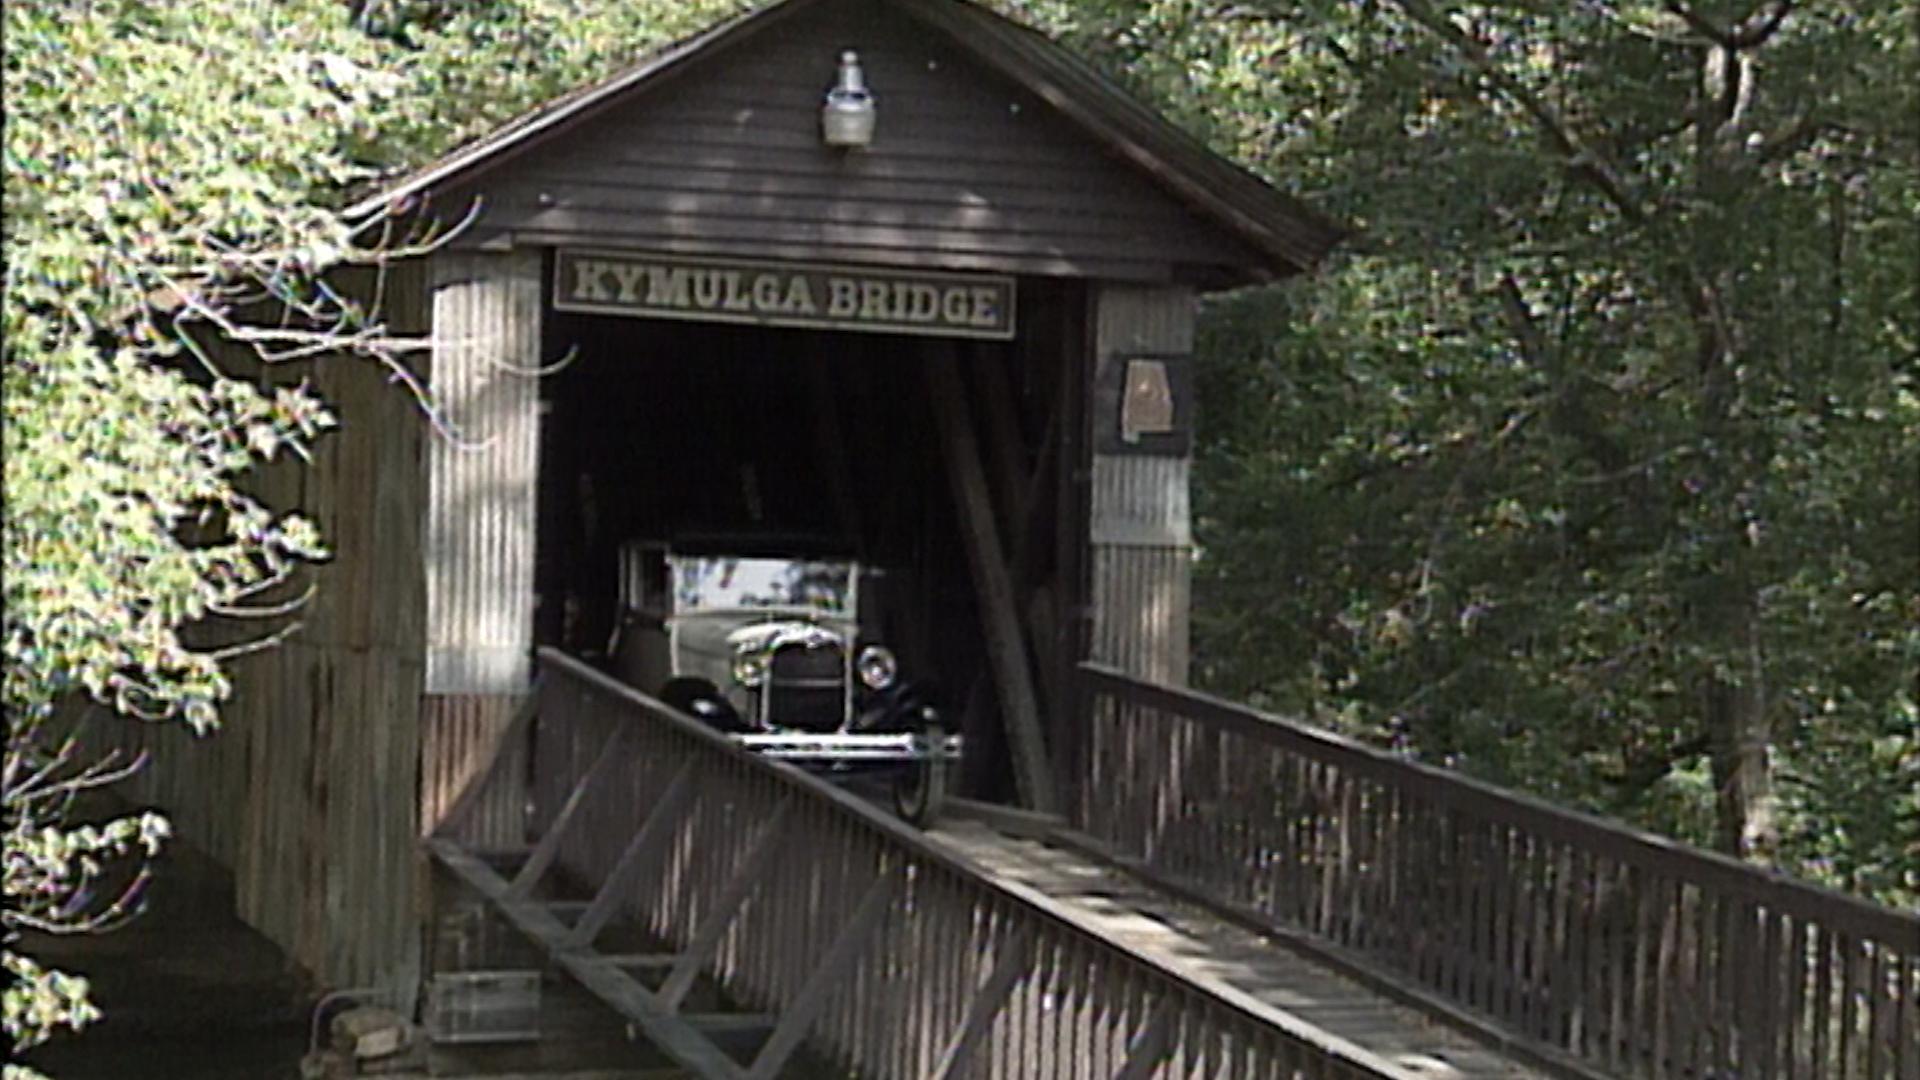 Kymulga Bridge in Childersburg, Alabama